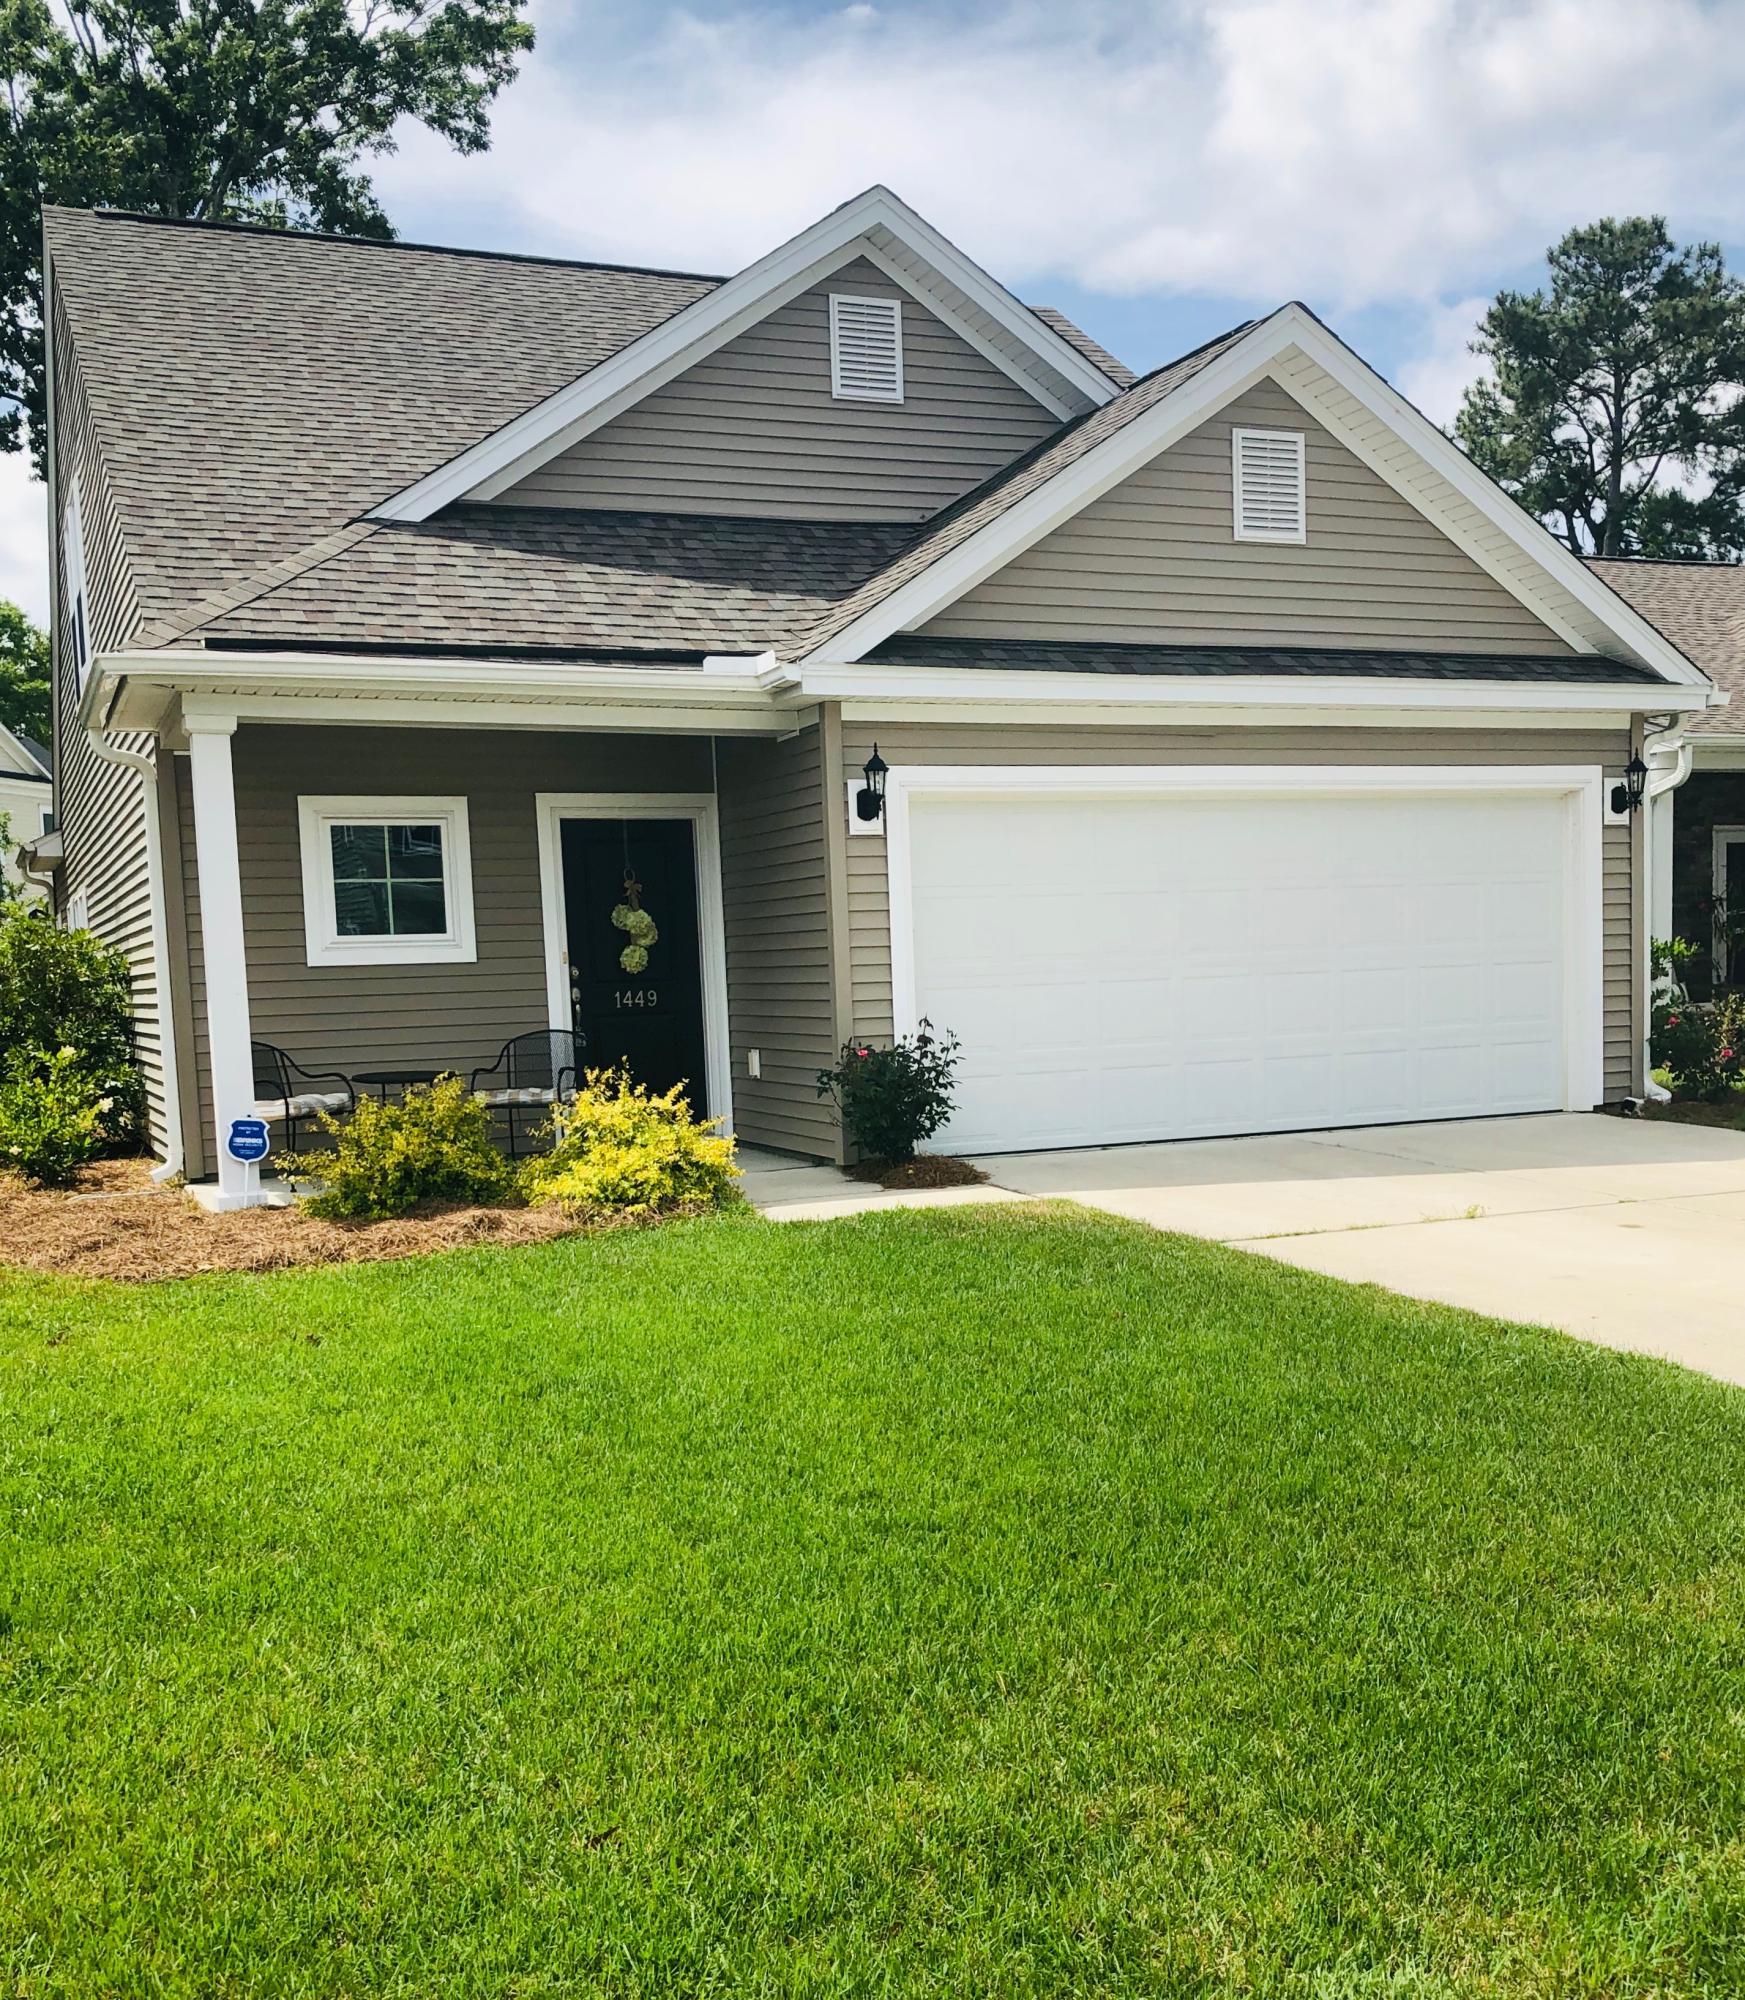 Tupelo Homes For Sale - 1449 Oldenburg, Mount Pleasant, SC - 17